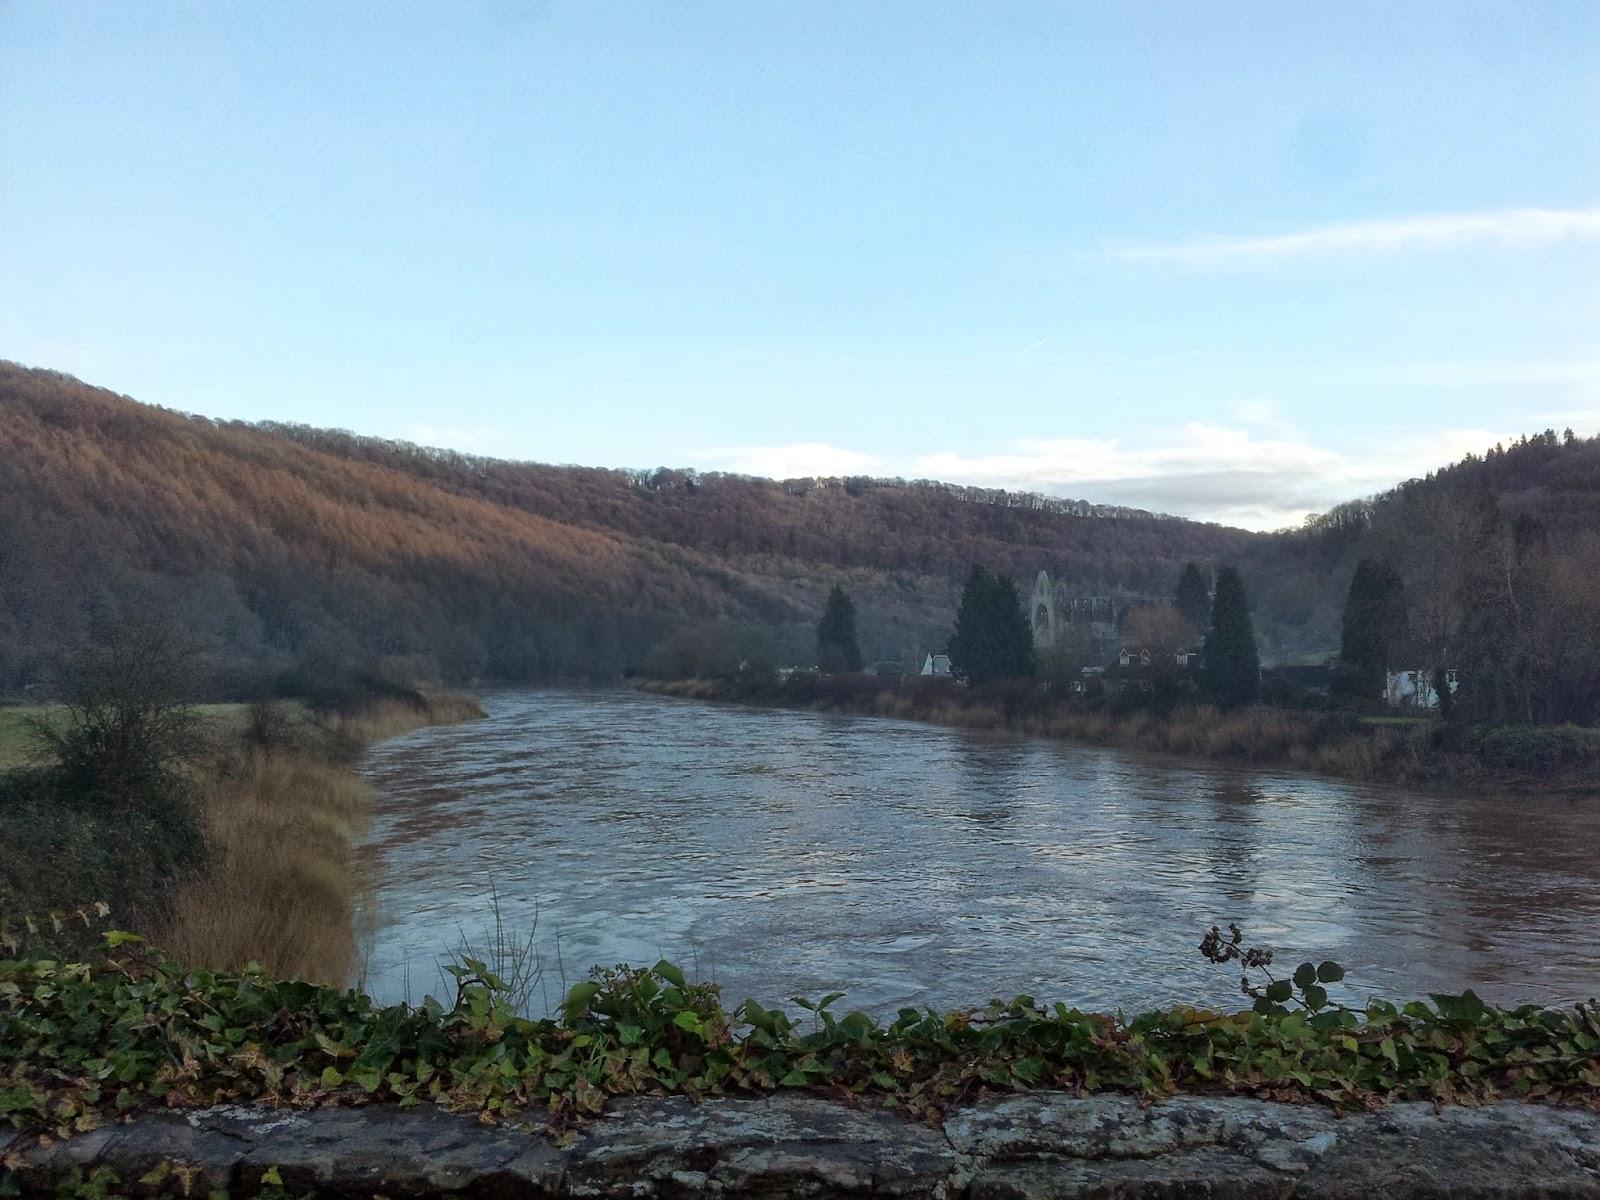 River Wye at dusk